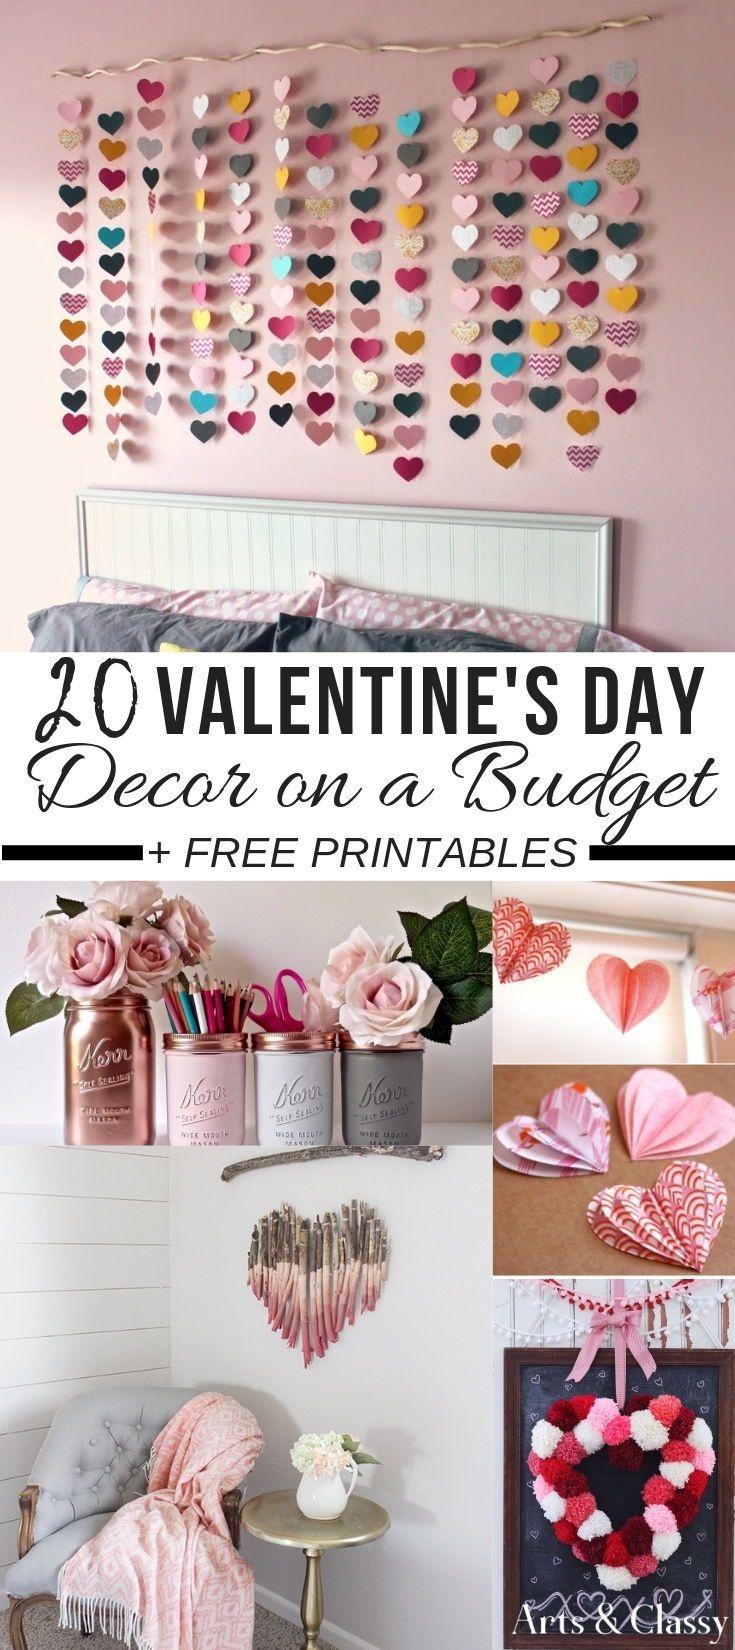 Valentine's Day Decor On A Budget + Free Printables | Valentines - Free Printable Valentine's Day Decorations